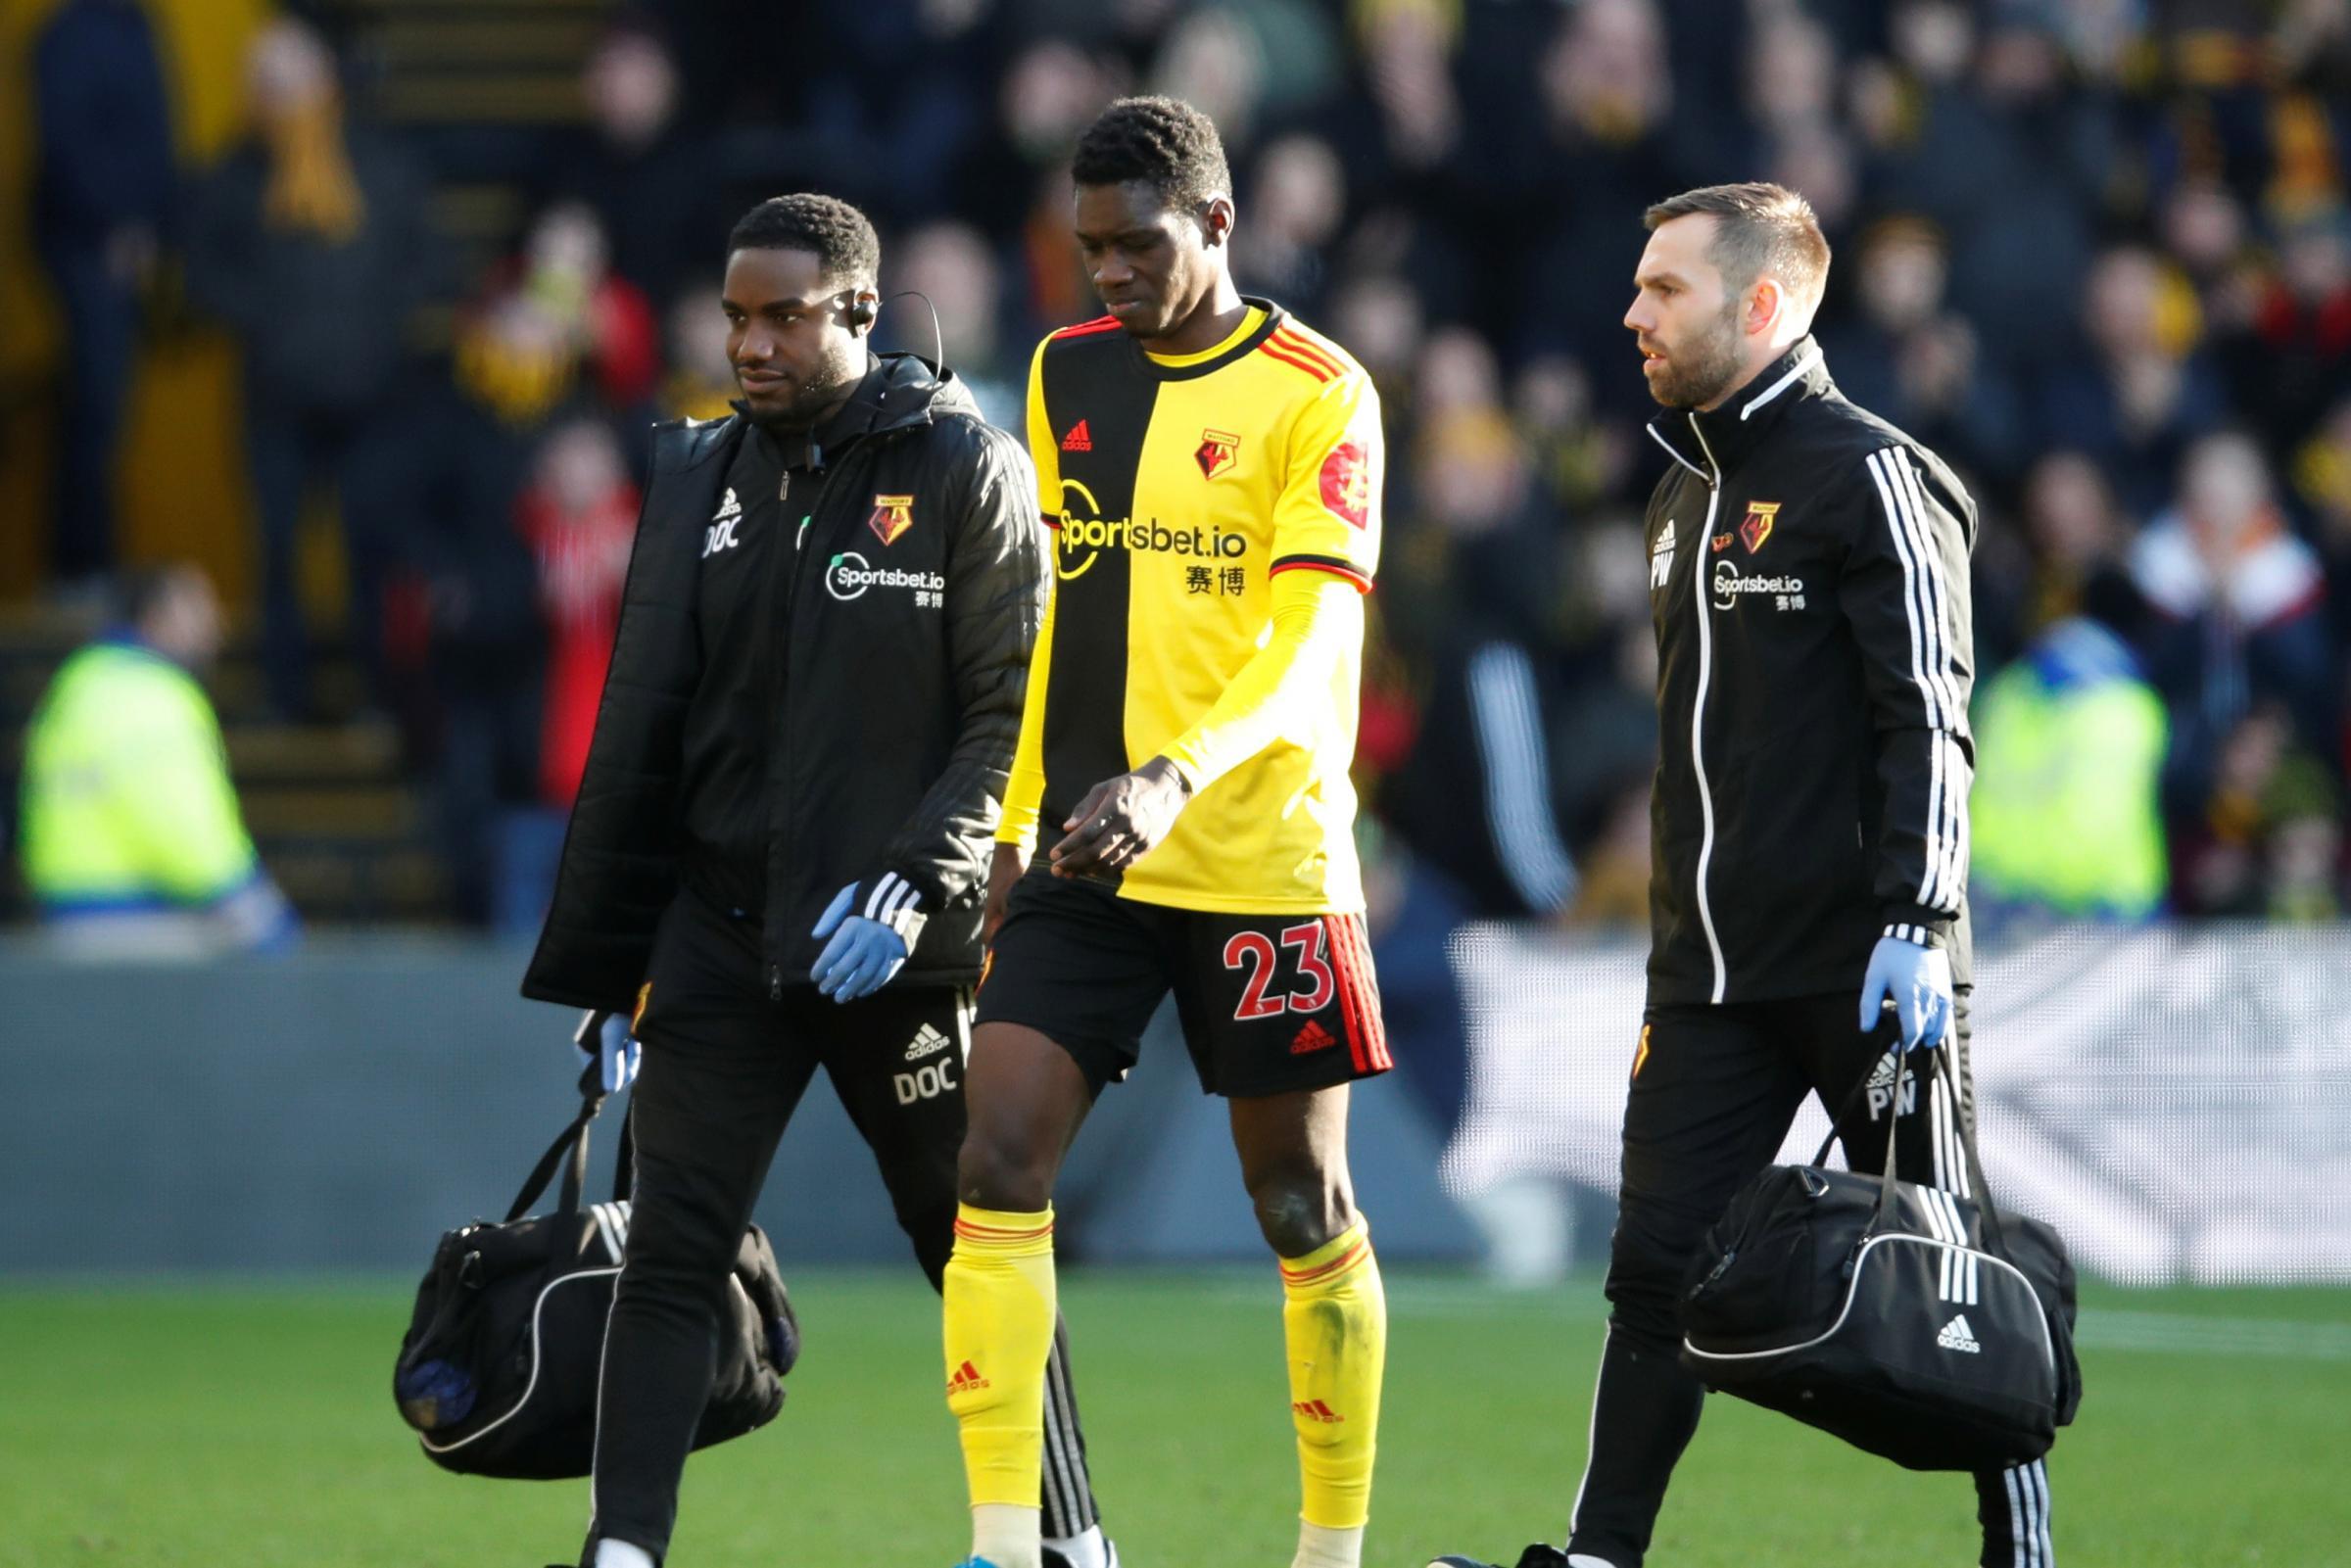 Ismaila Sarr to miss Watford's game against Aston Villa after Tottenham Hotspur injury